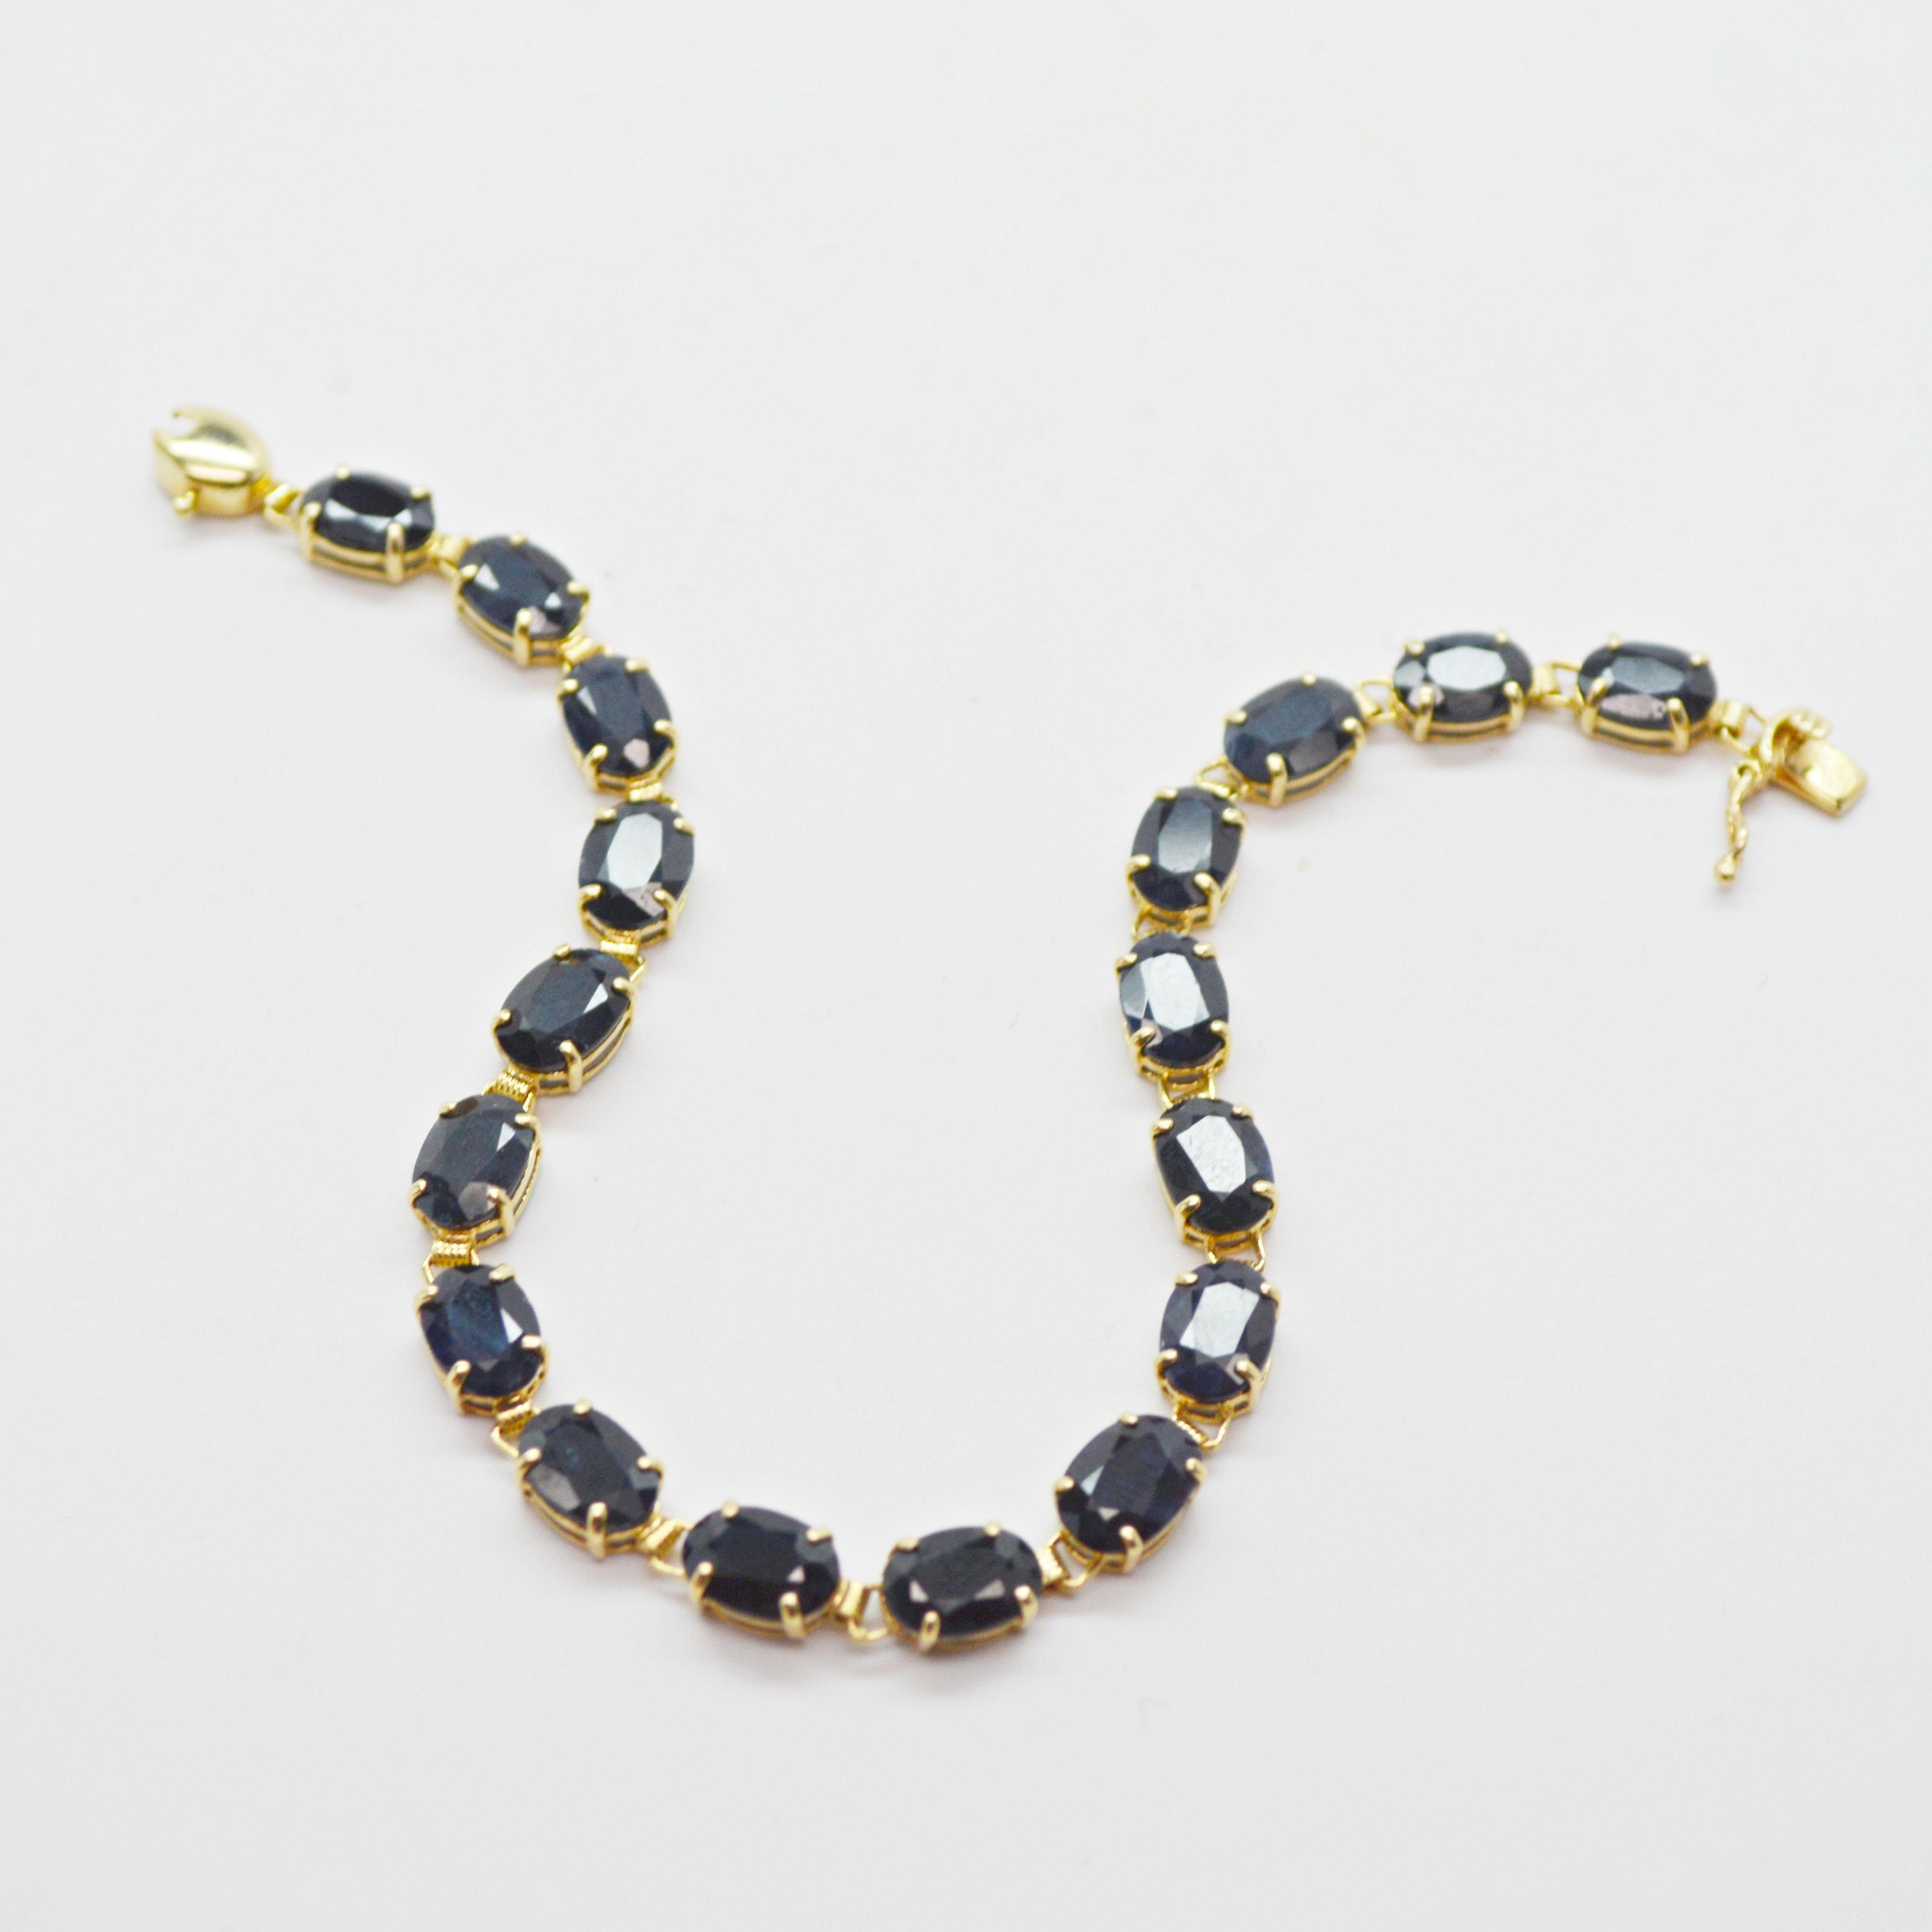 14K Yellow Gold Black Sapphire Bracelet